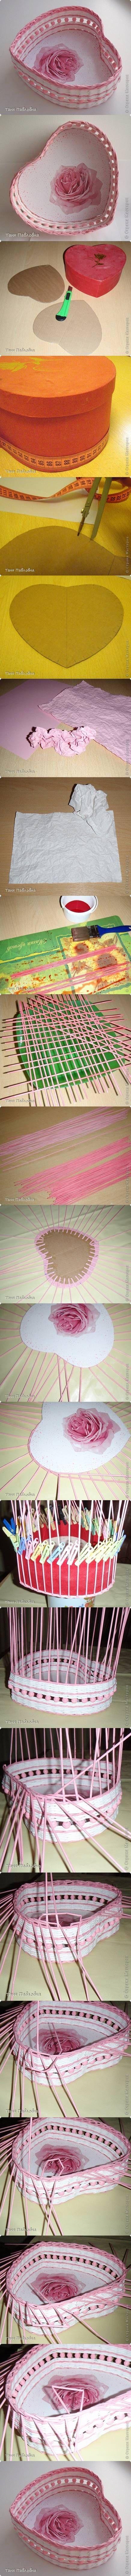 DIY Heart Paper Basket DIY Projects / UsefulDIY.com